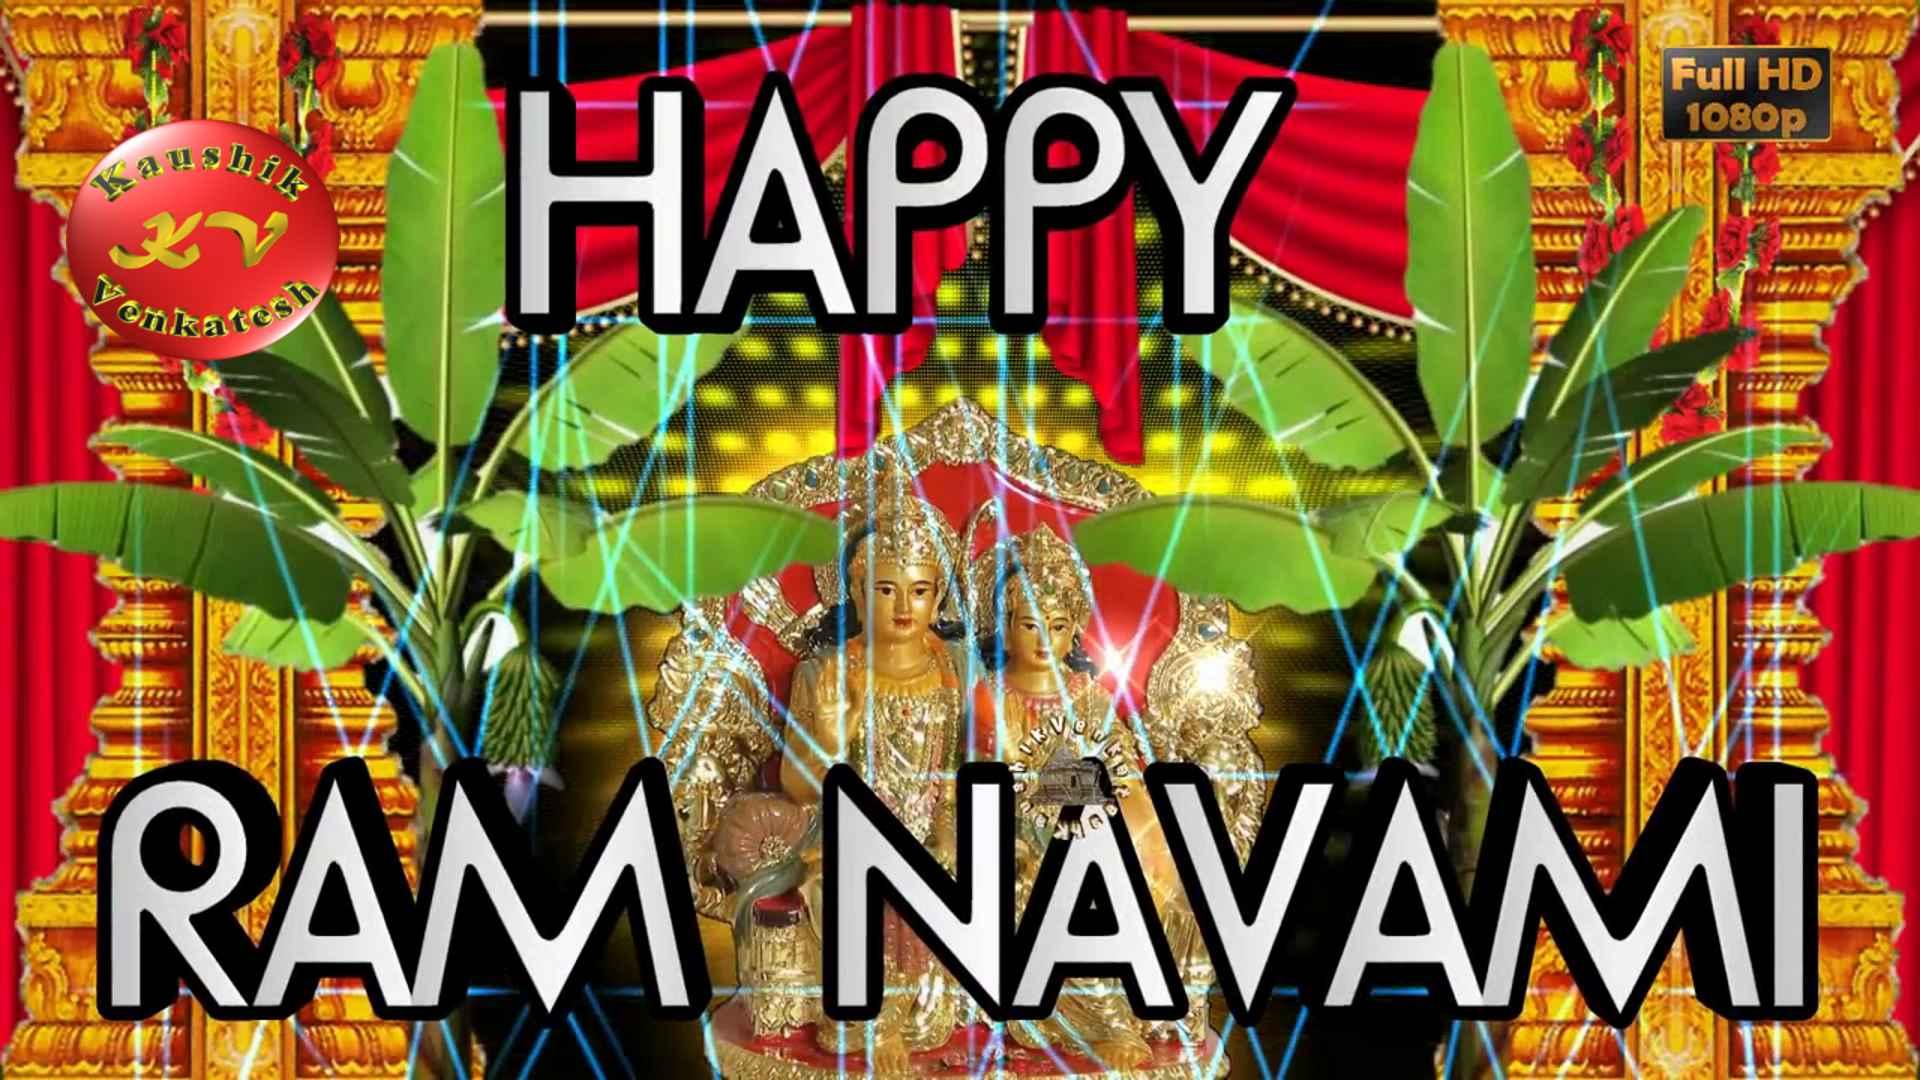 Happy Ram Navami Images